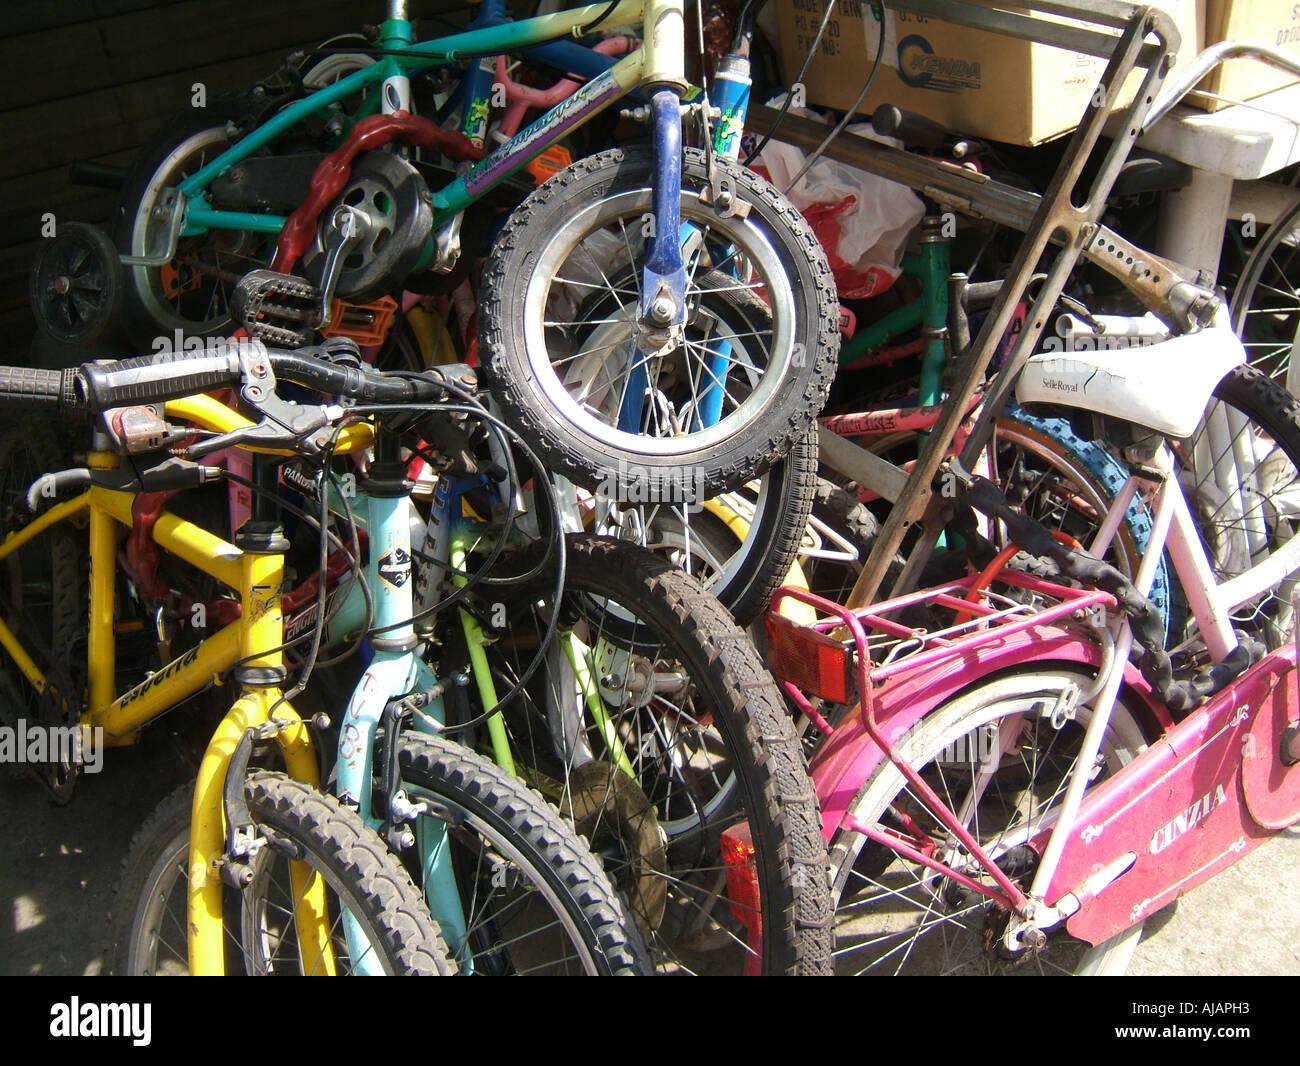 pile of second hand bikes Stock Photo: 8387218 - Alamy